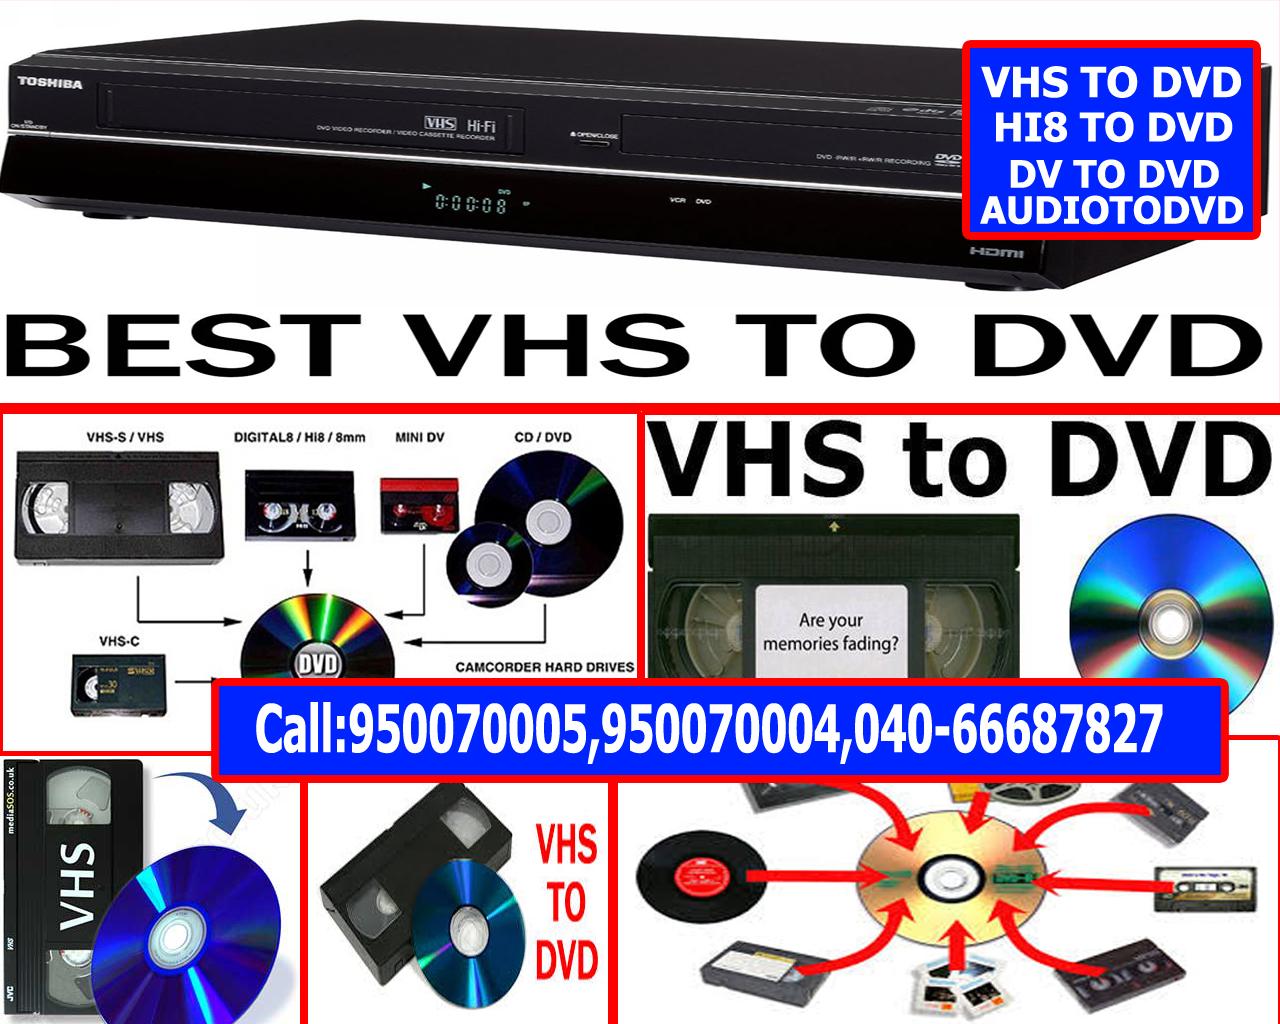 Video8 Hi8 Digital8 Cassettes to MP4 or DVD - VCR VHS